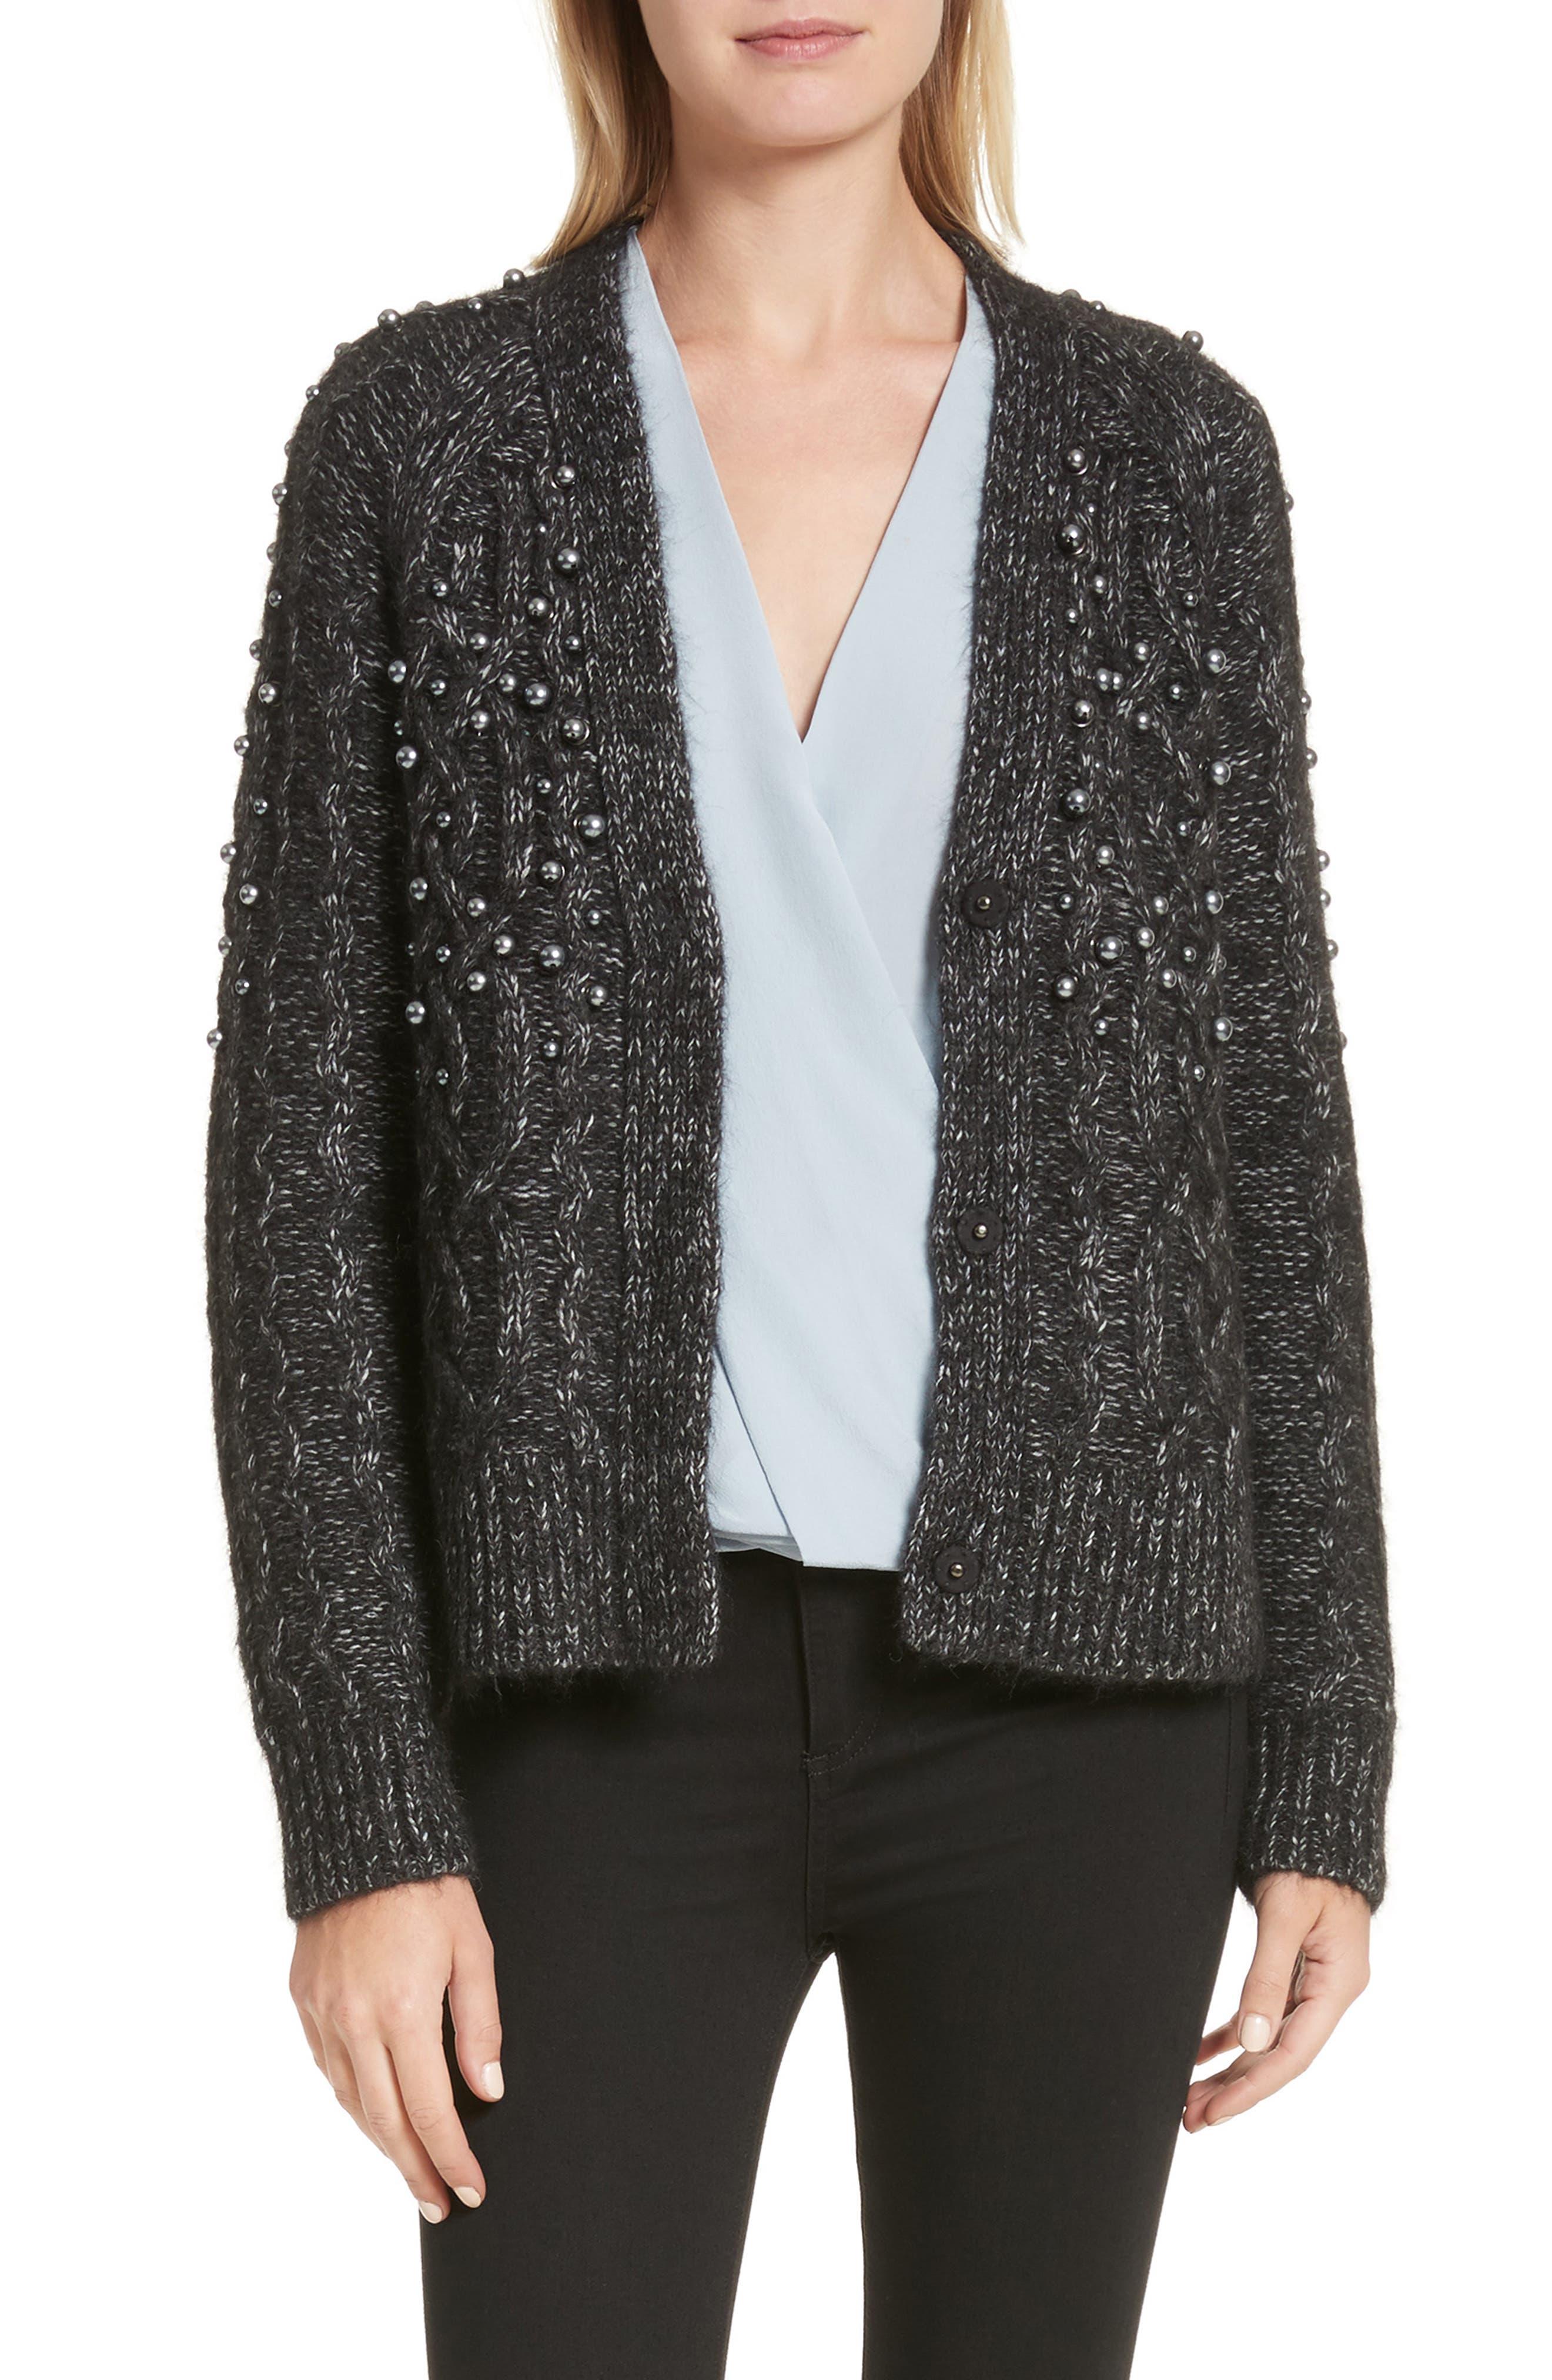 Jemma Imitation Pearl Embellished Cardigan,                         Main,                         color, Charcoal